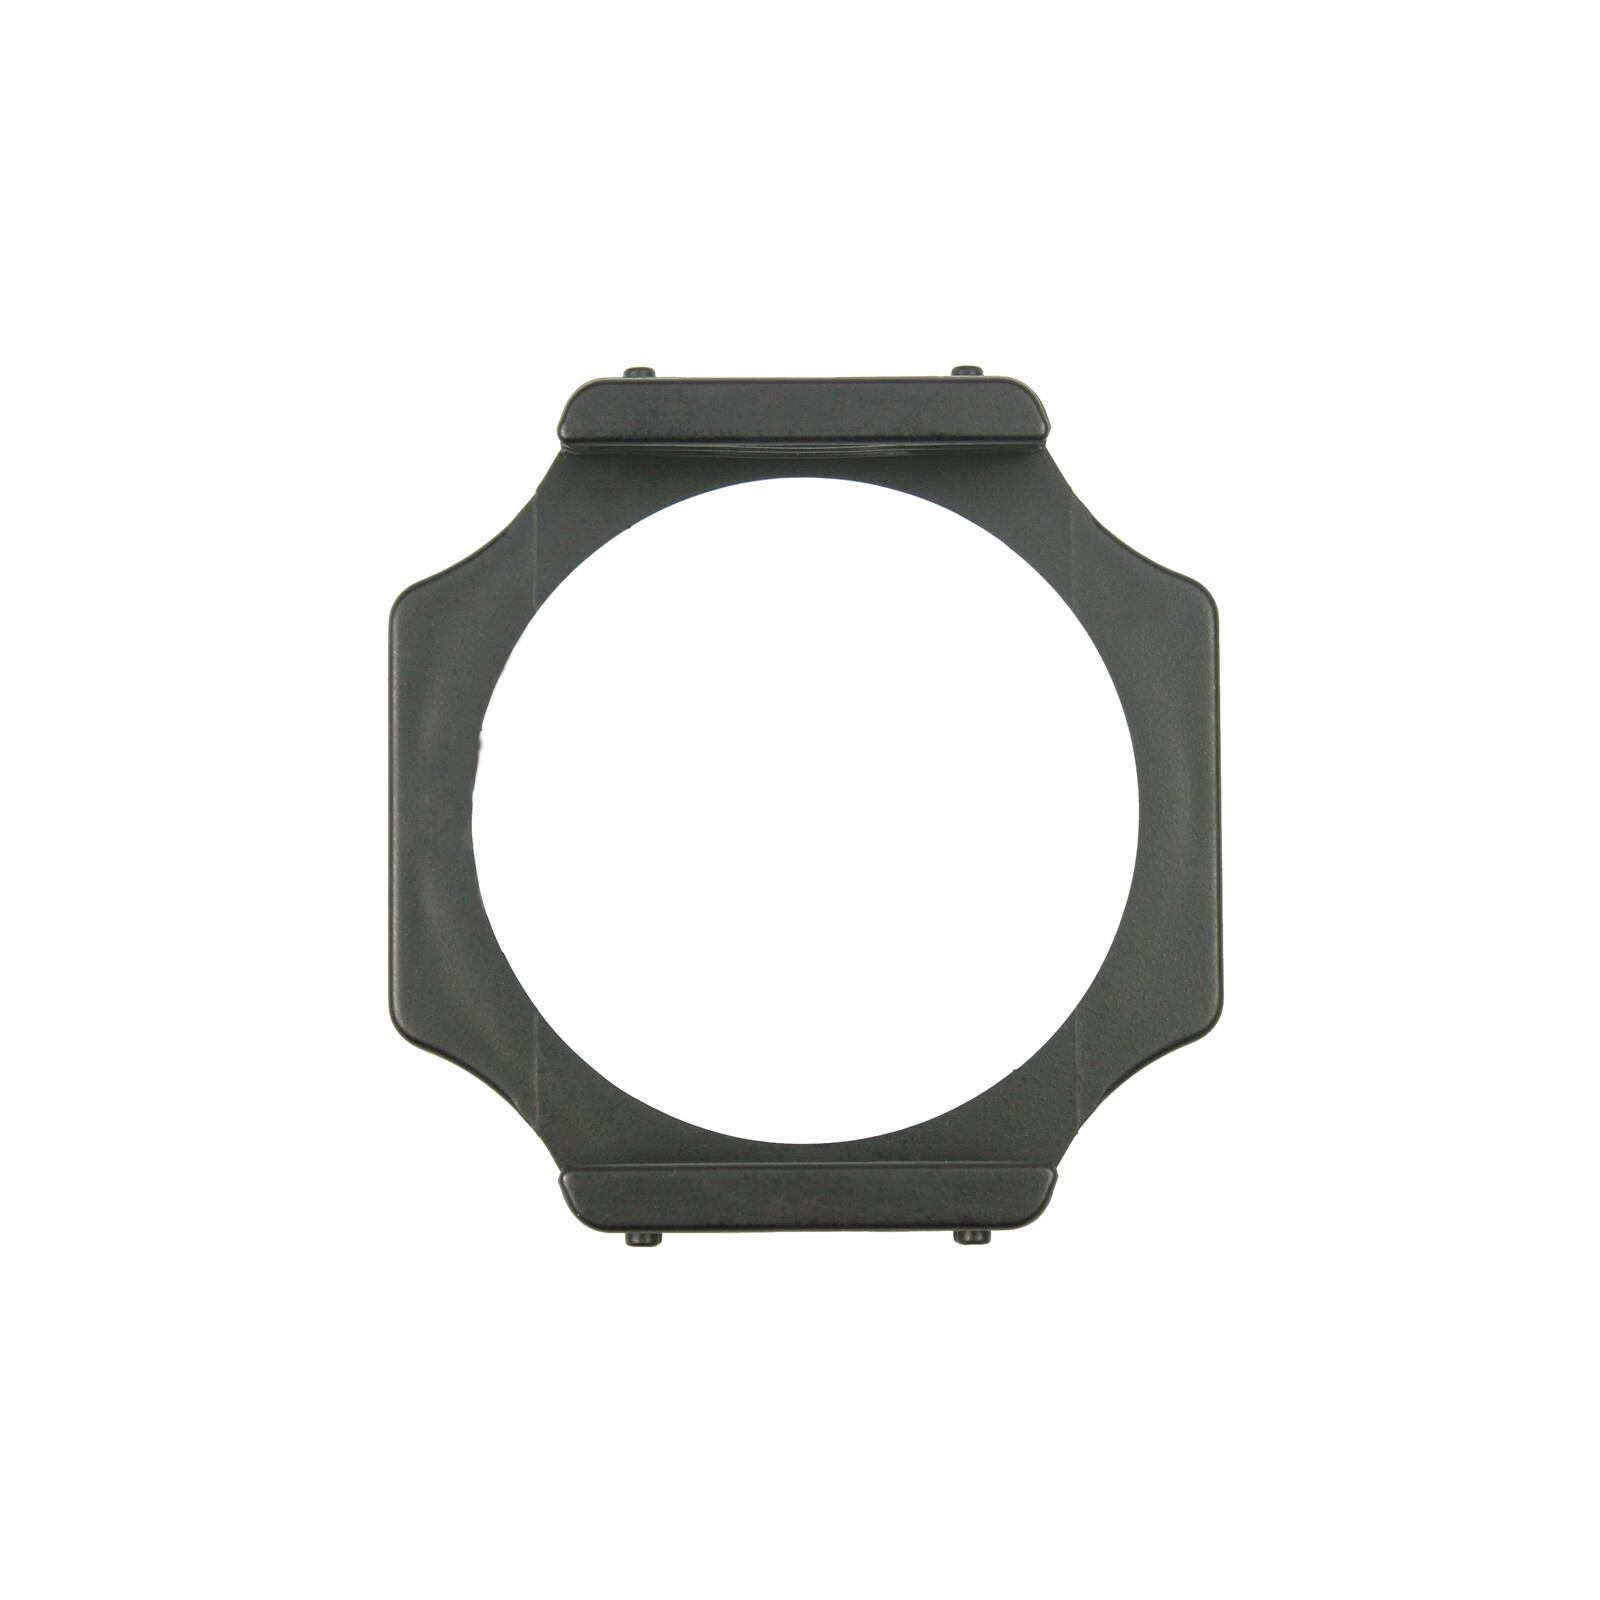 Dörr Go2 Metall Anschlussring 52mm